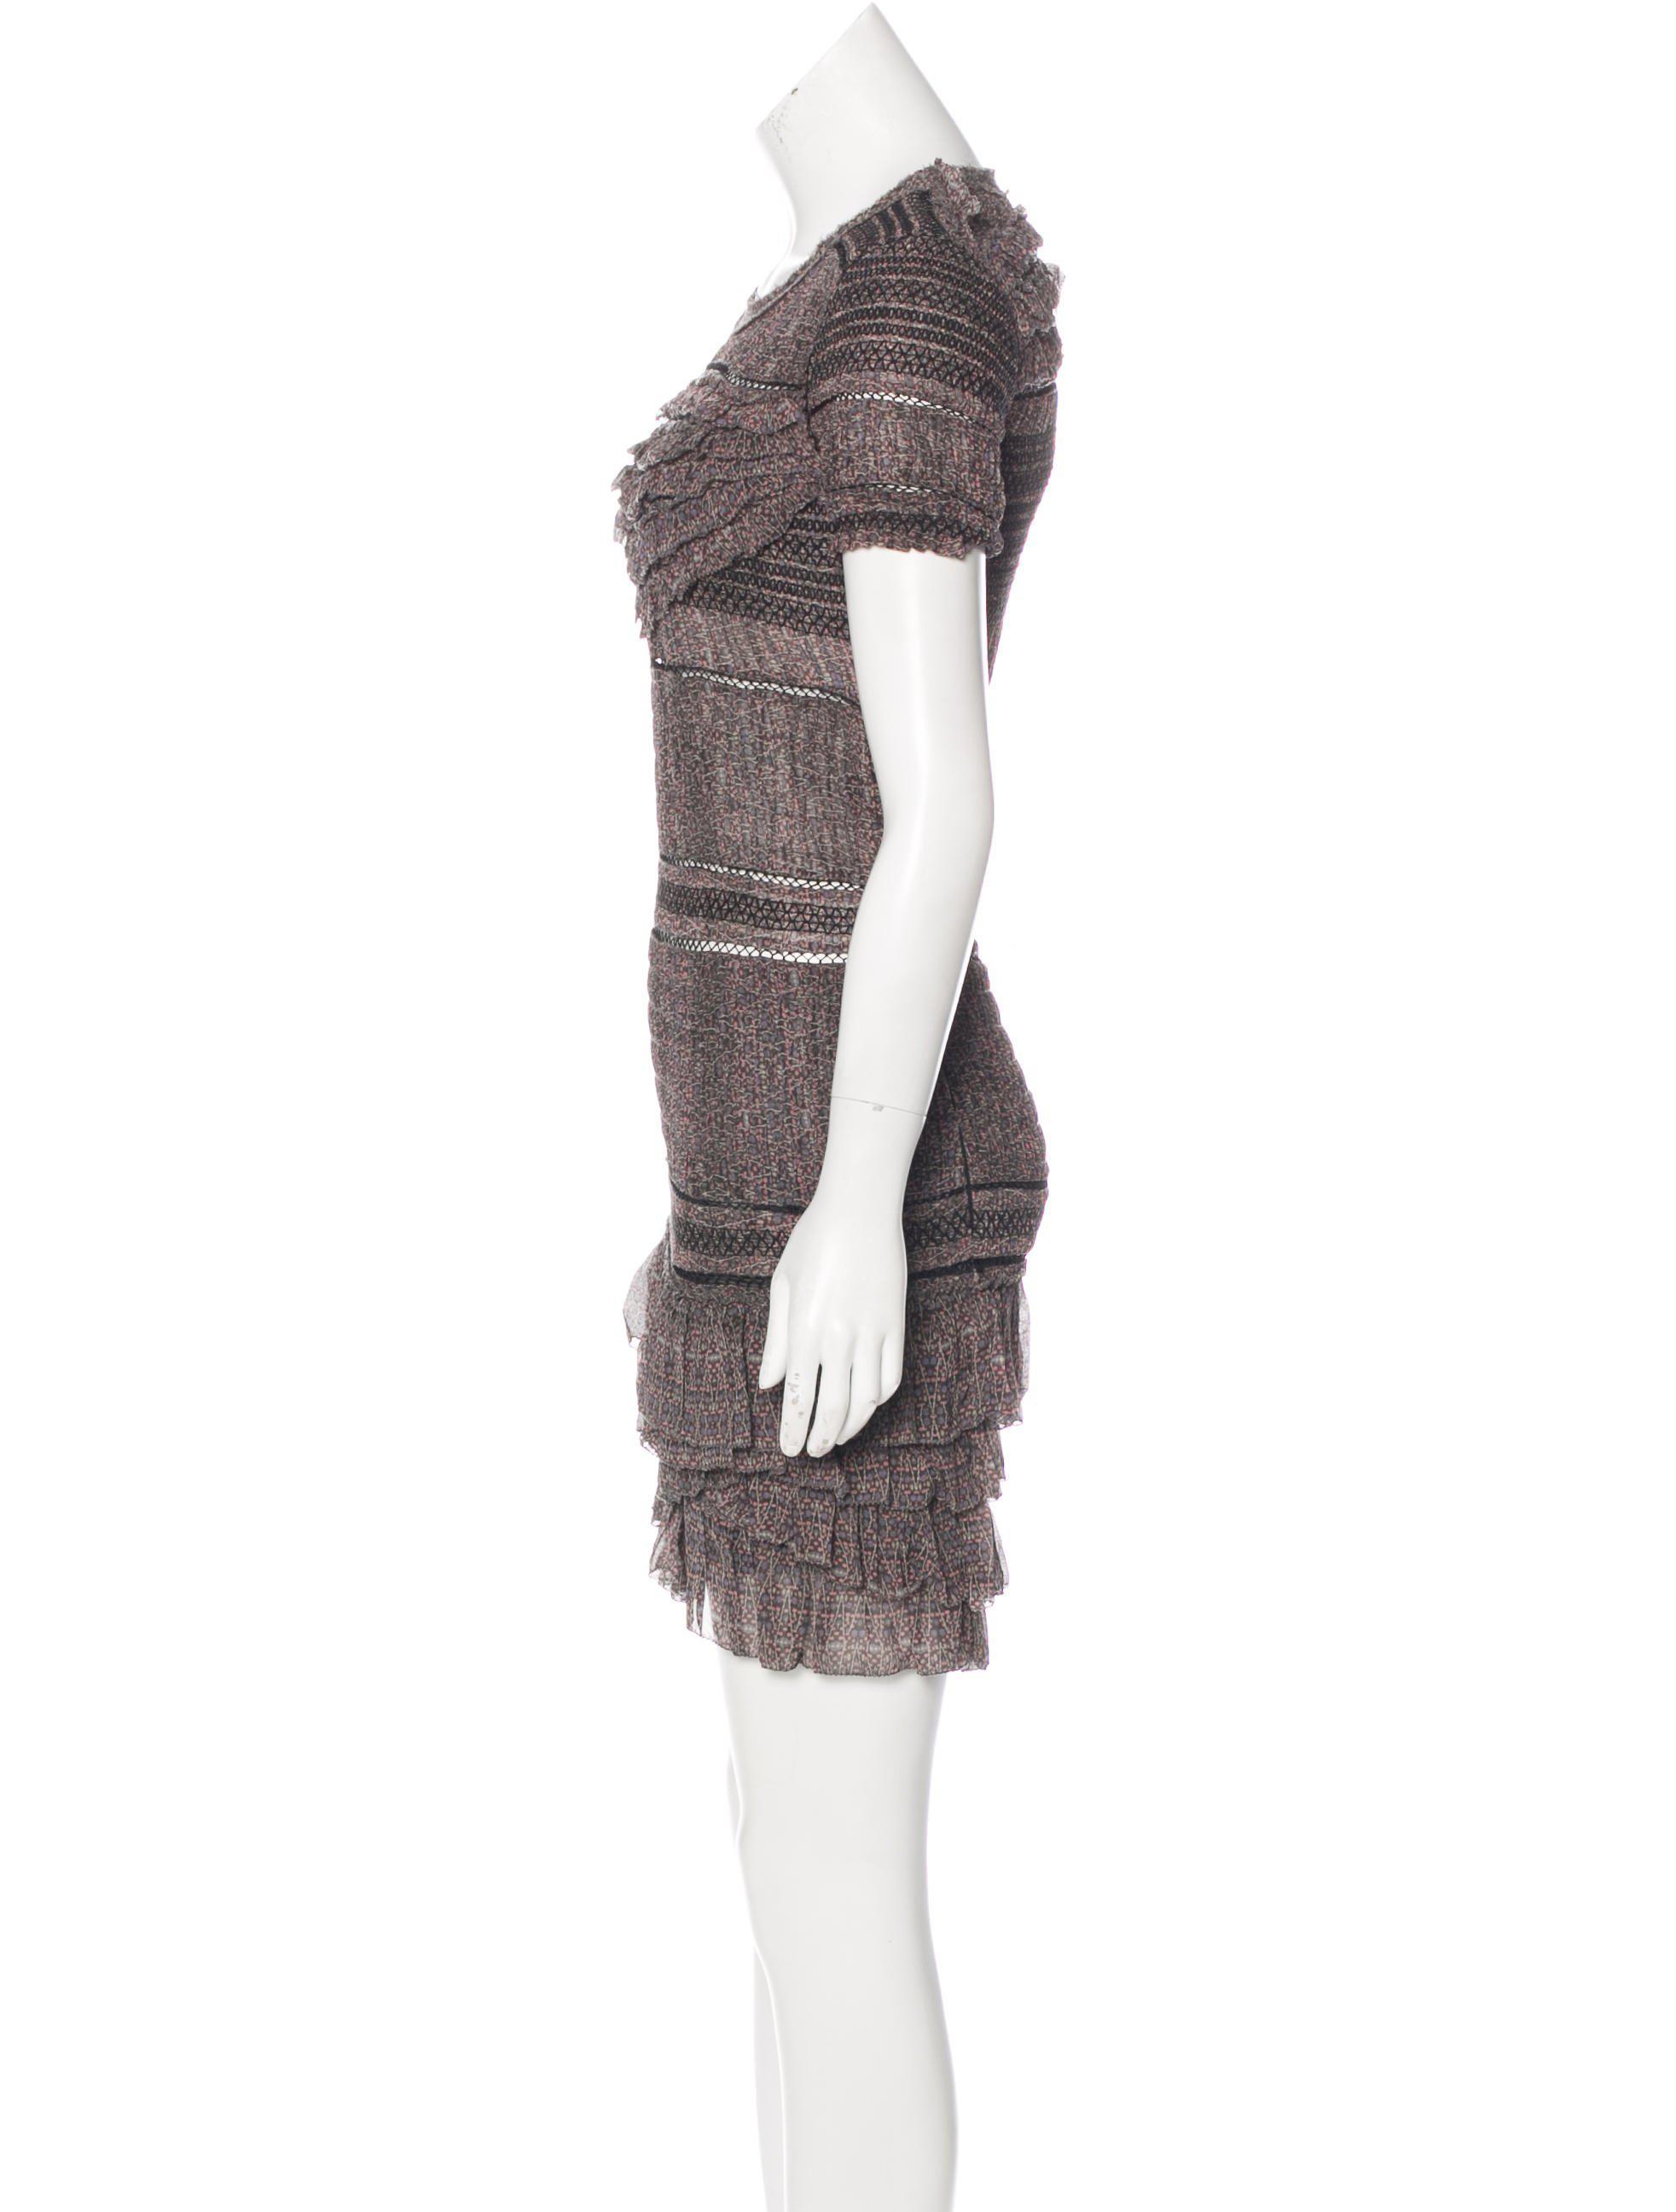 Lyst - Isabel Marant Silk Crepe Dress Aubergine in Purple